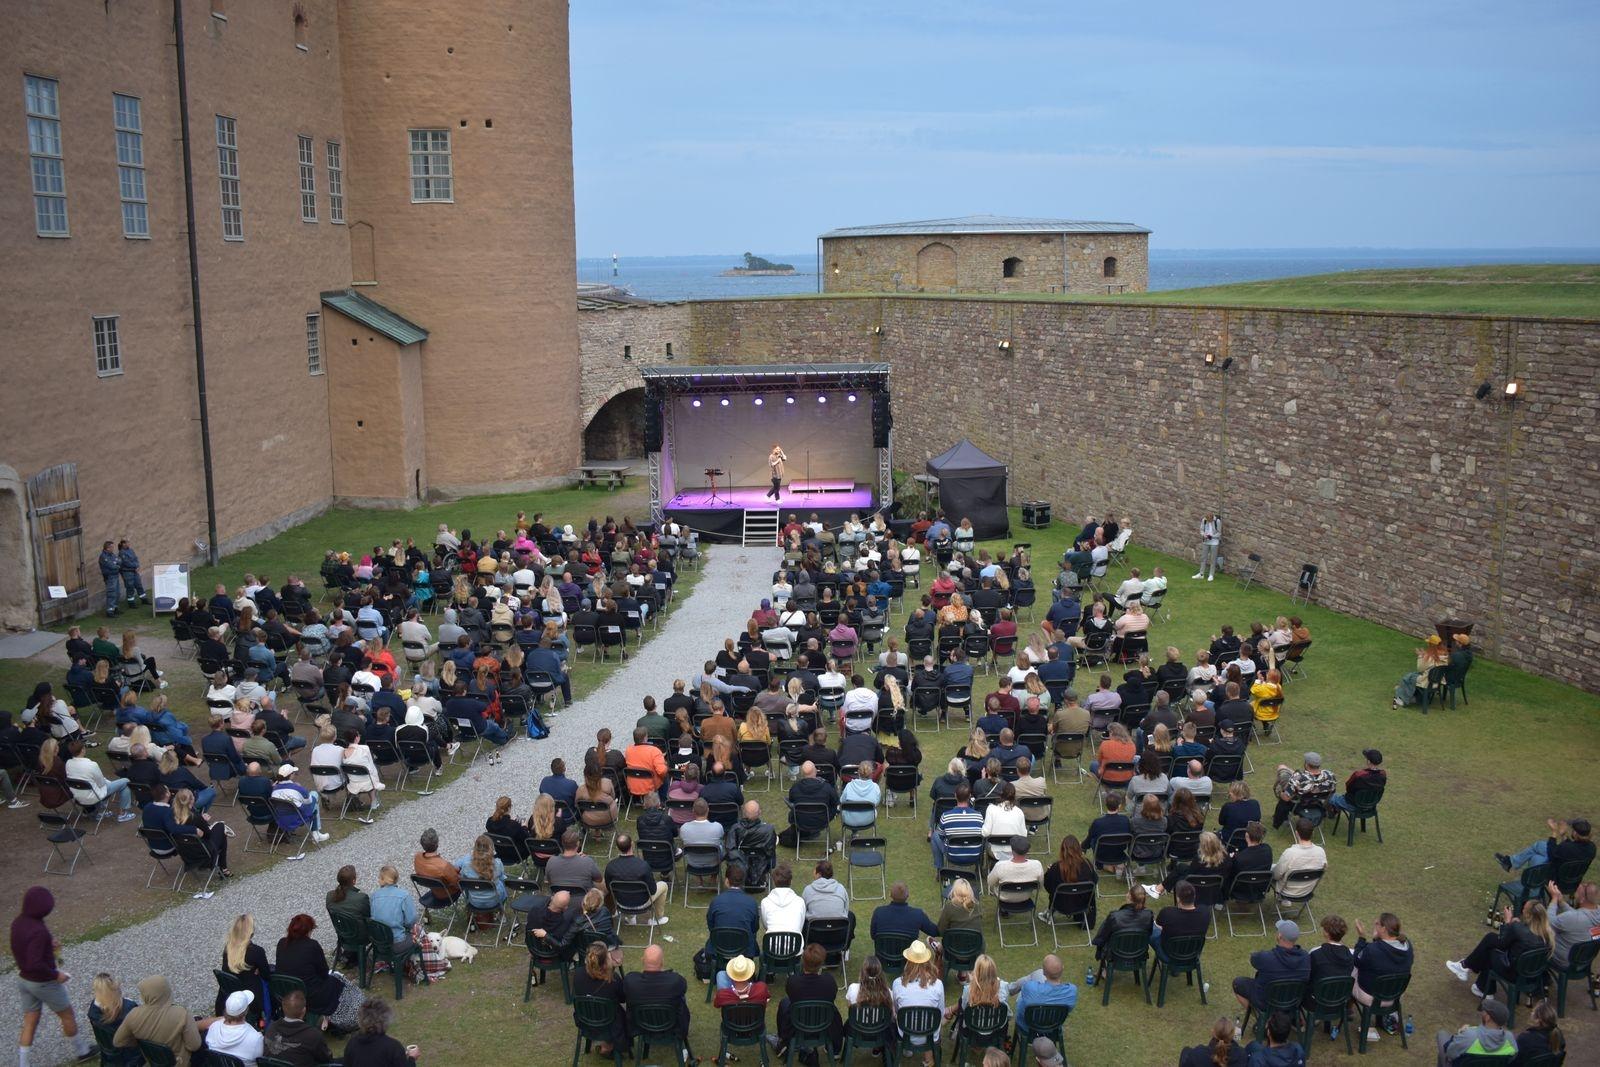 Fullsatt på Kalmar slotts yttre borggård.